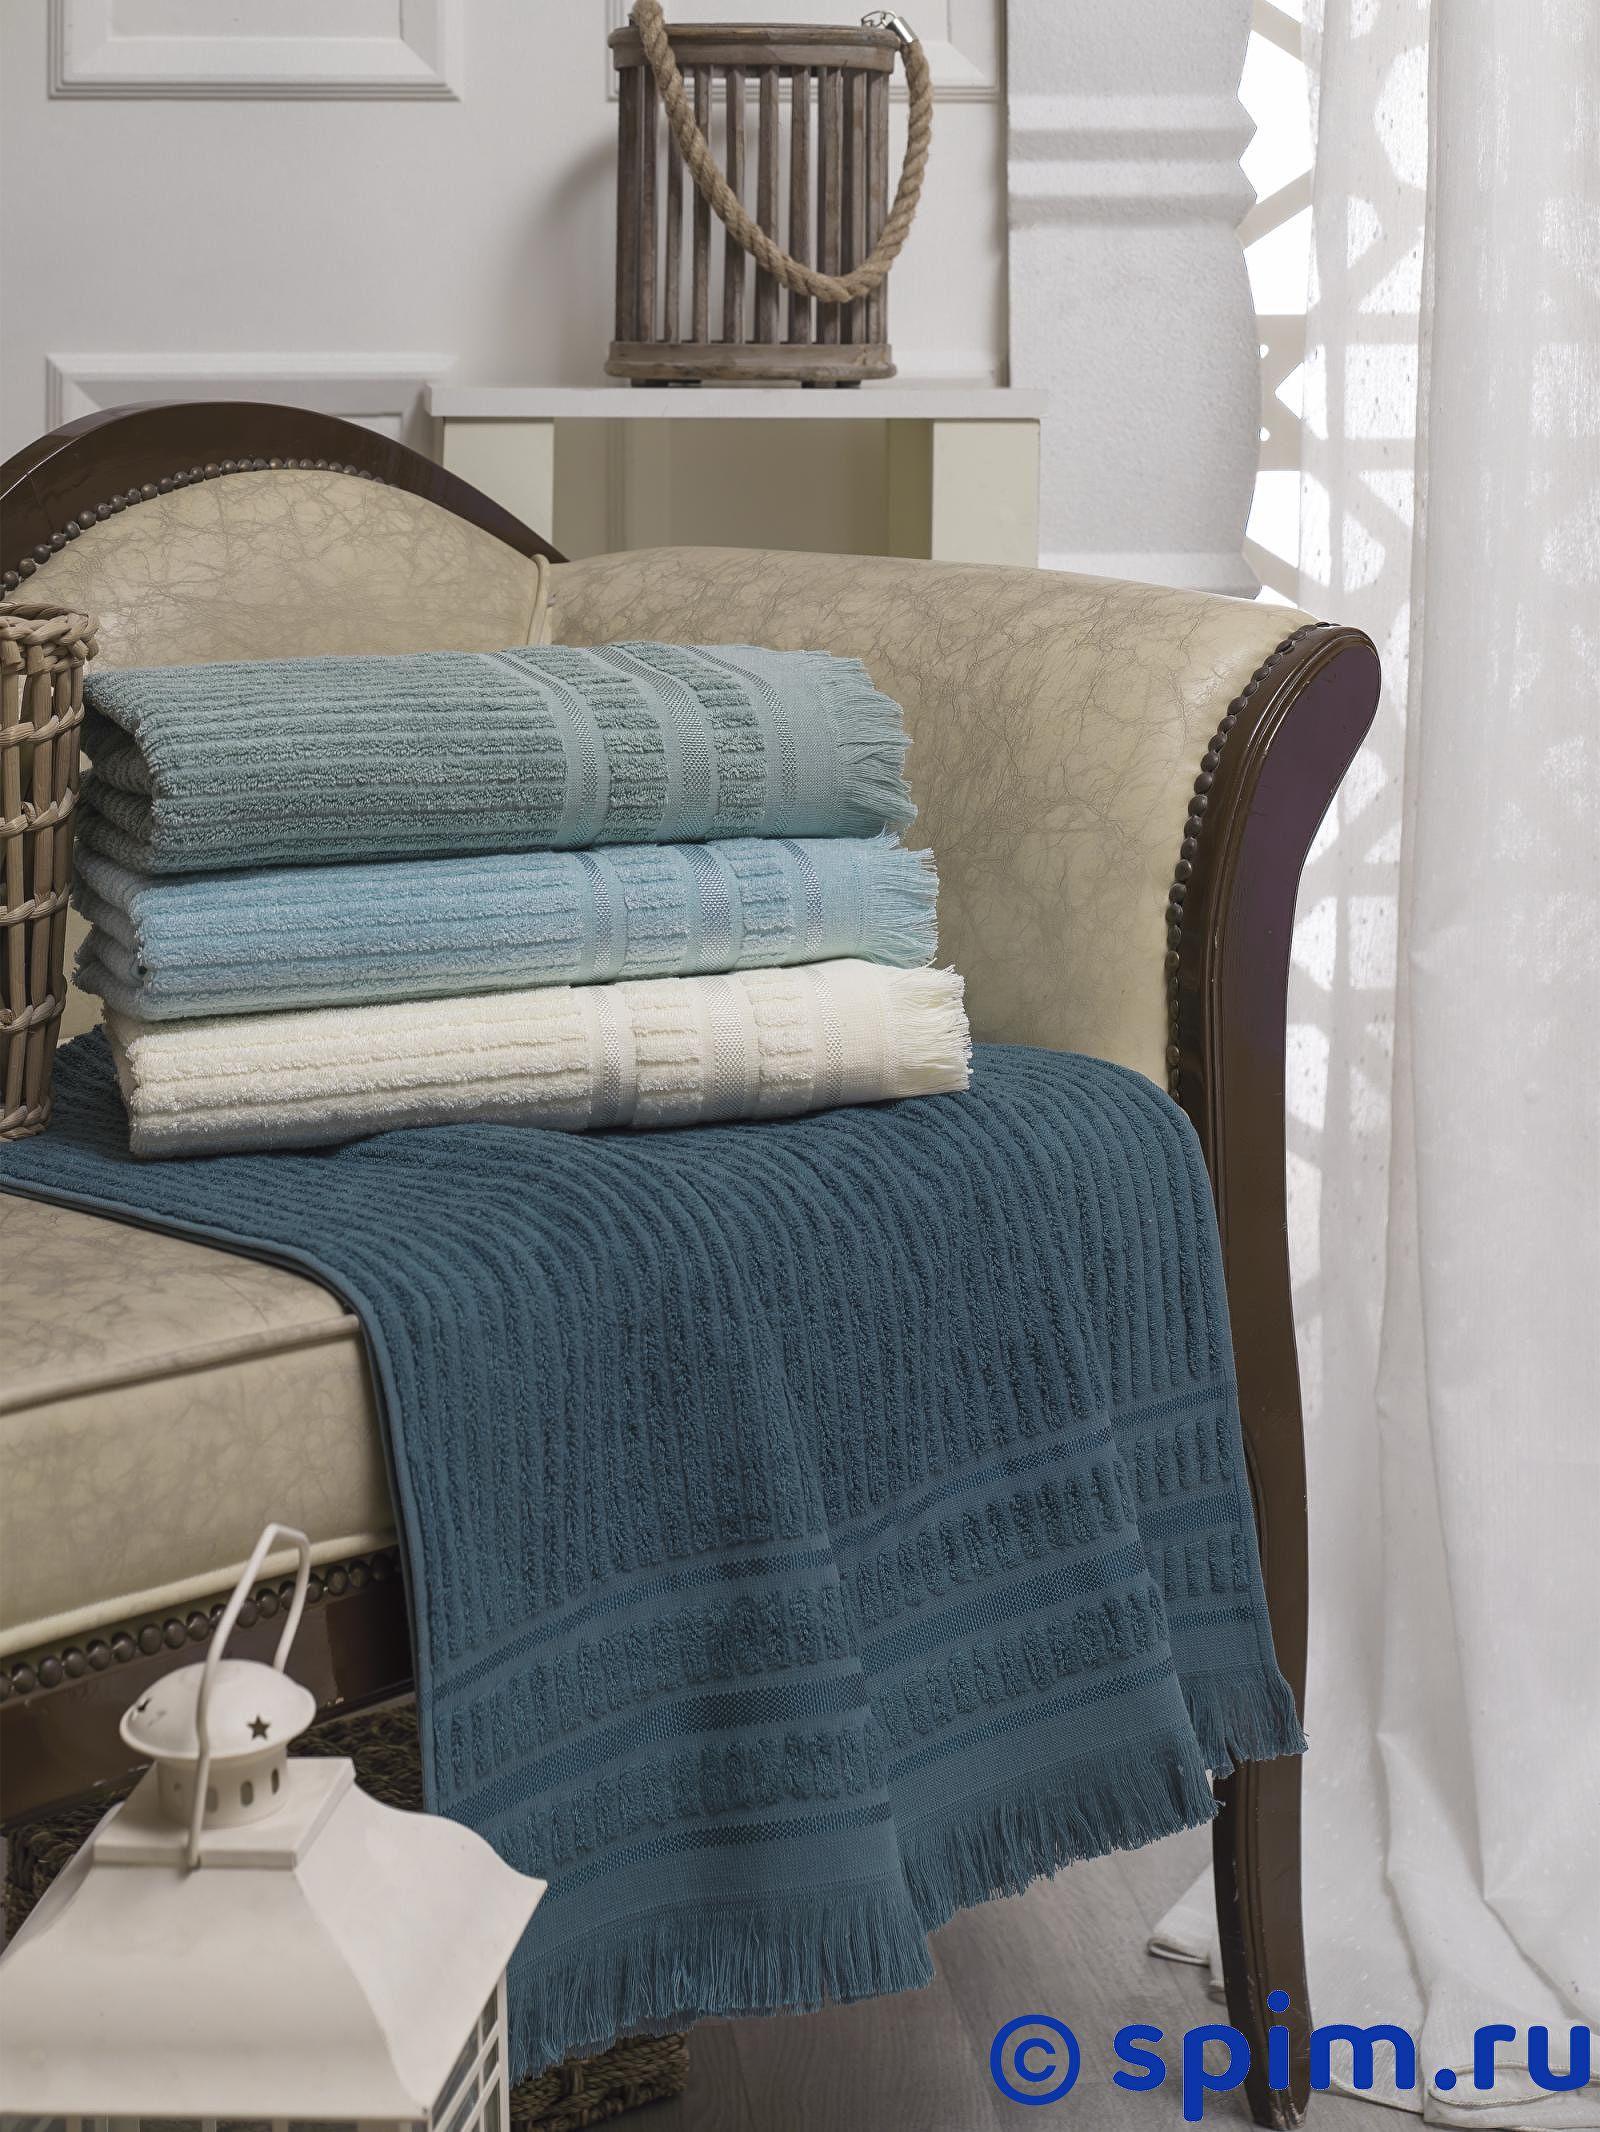 Набор из 4-х полотенец Do&co Melissa 70х140 см полотенца do n co полотенце lady цвет мятный набор